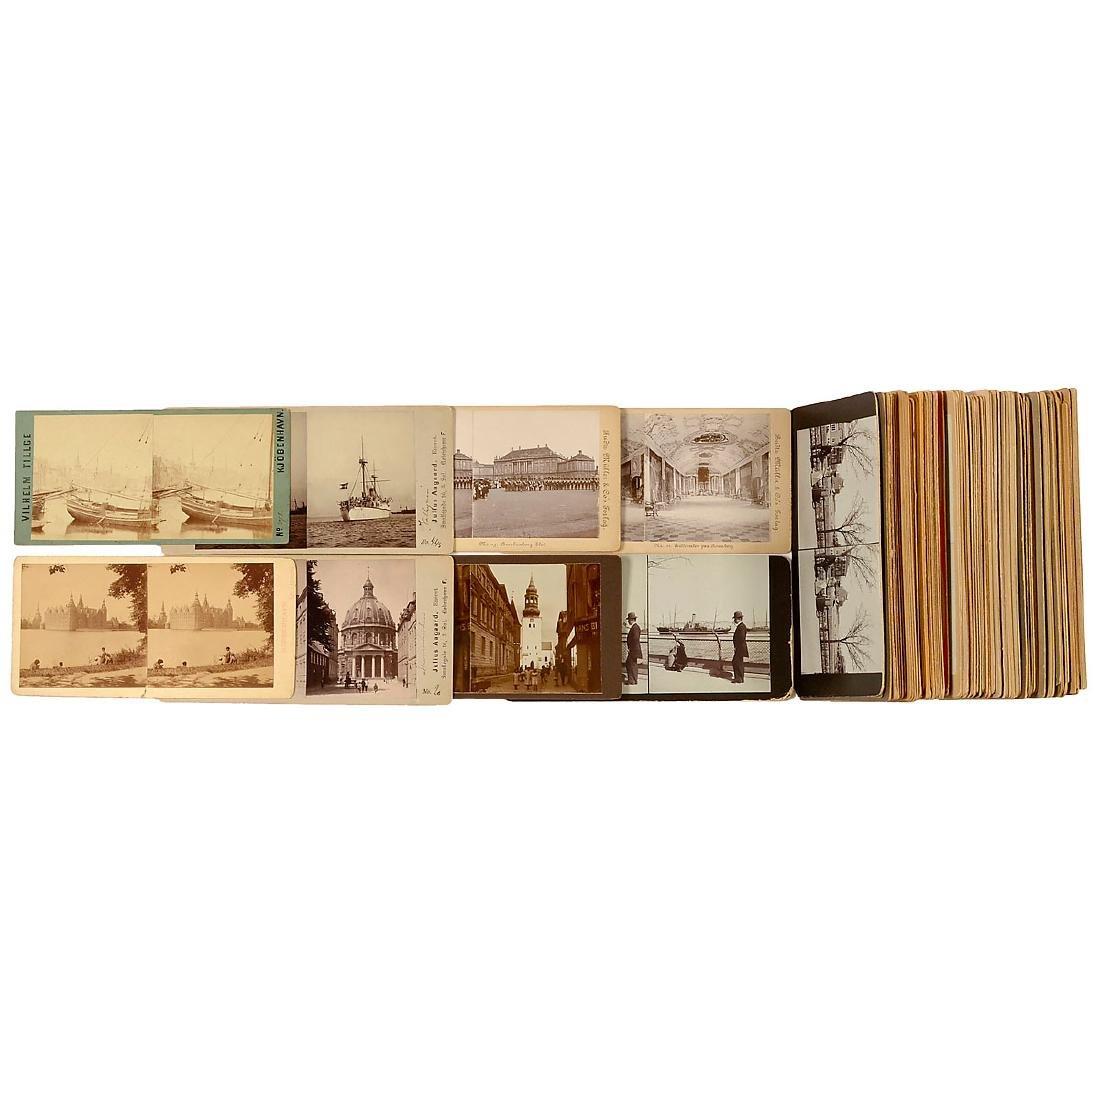 "93 Stereo Cards ""Denmark"" 9 x 18 cm, c. 1900"